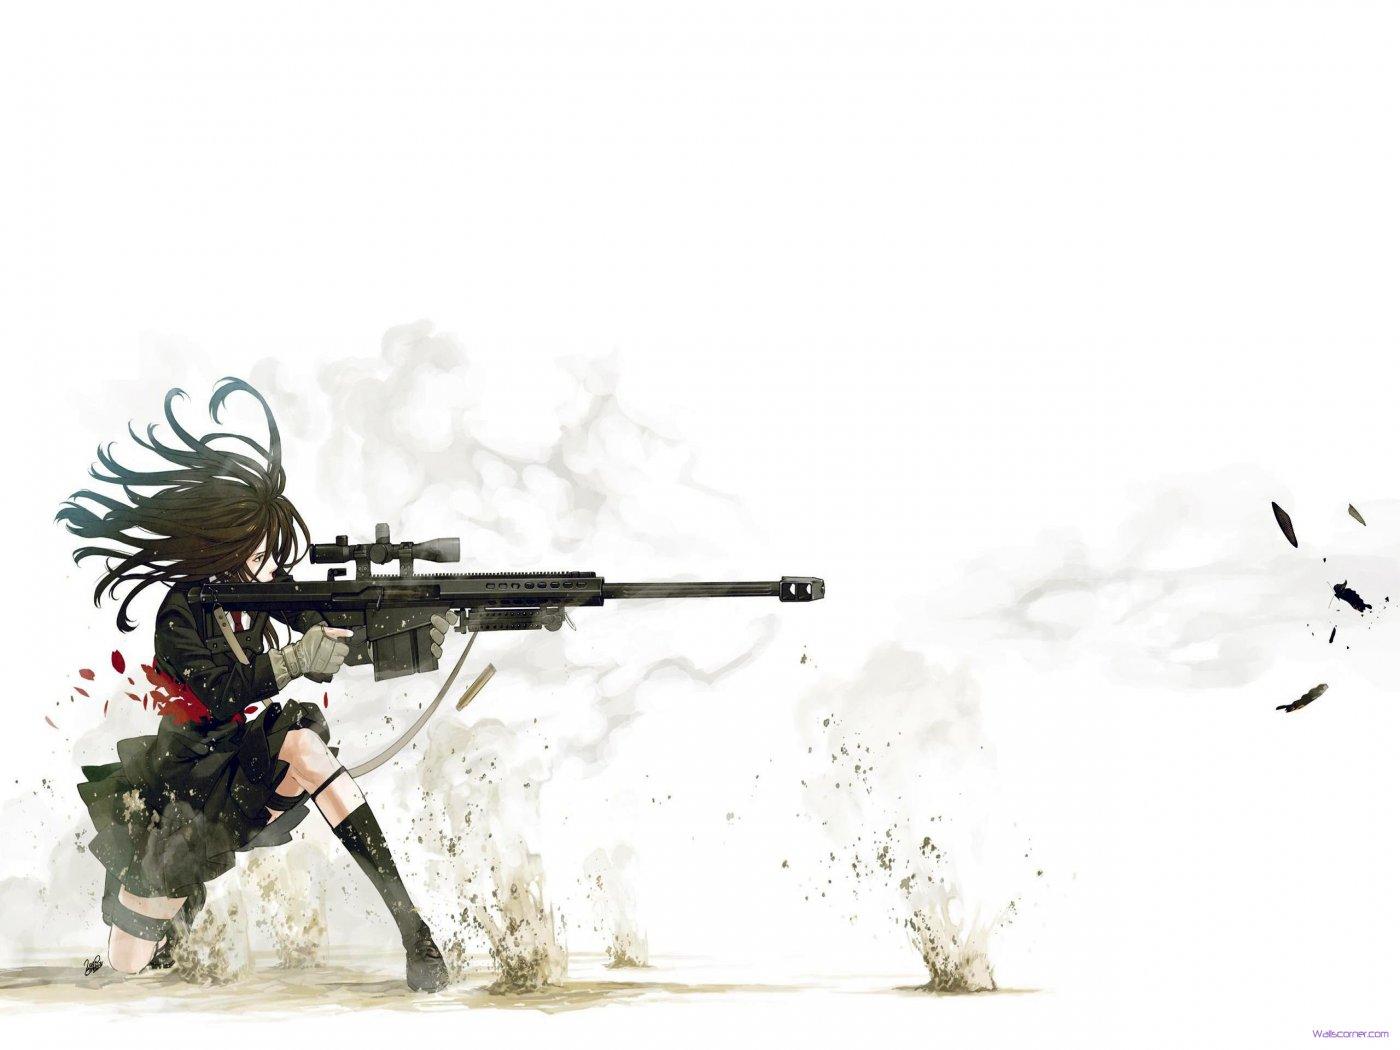 of anime sniper wide beauty anime sniper wide hd wallpaper wallpaper 1400x1050